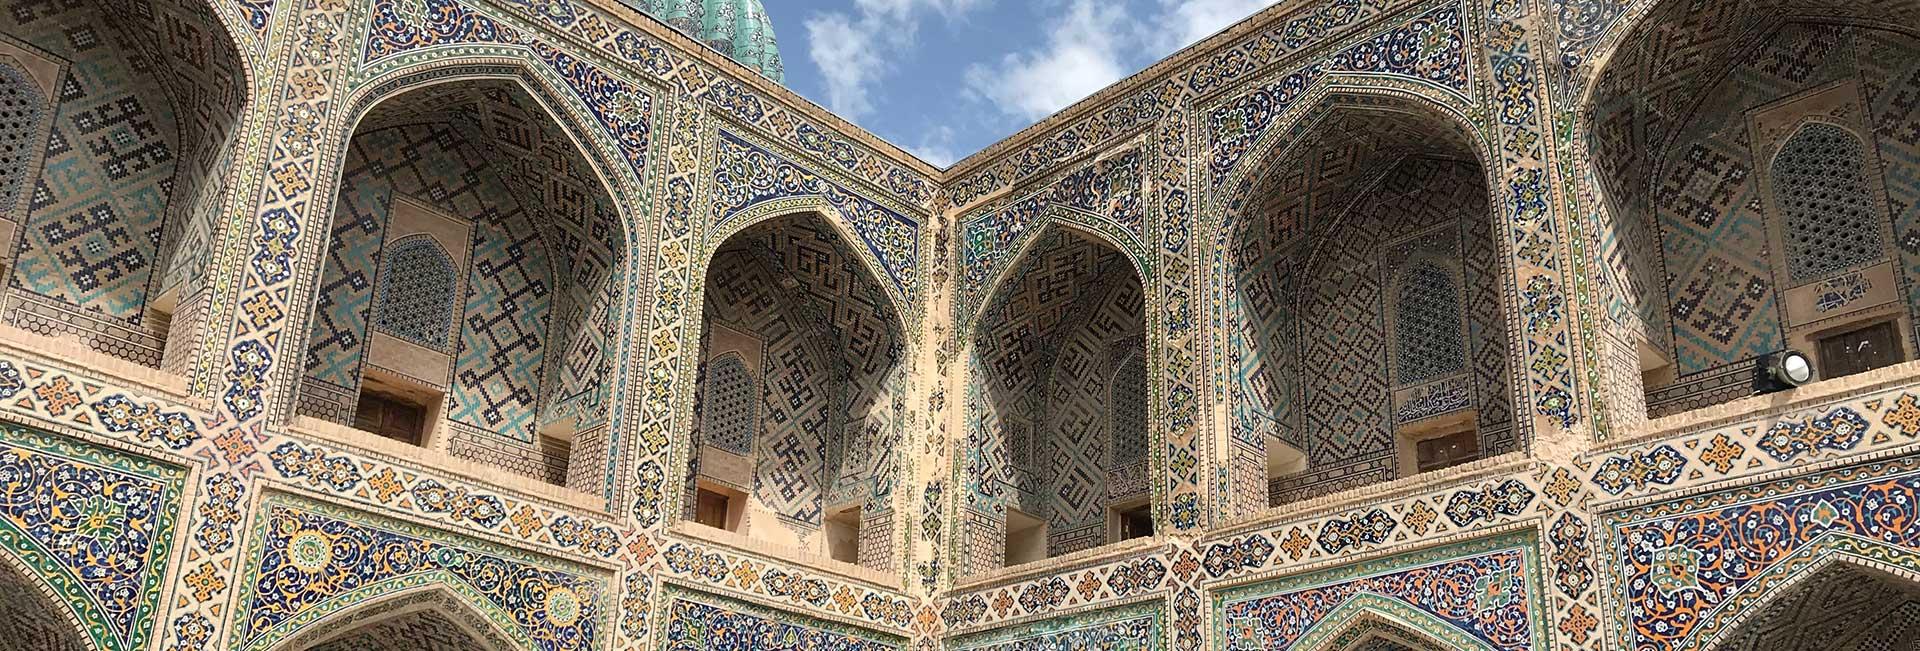 Registan Square in Samarkand, Uzbekistan. Photo credit: Abdu Samadov